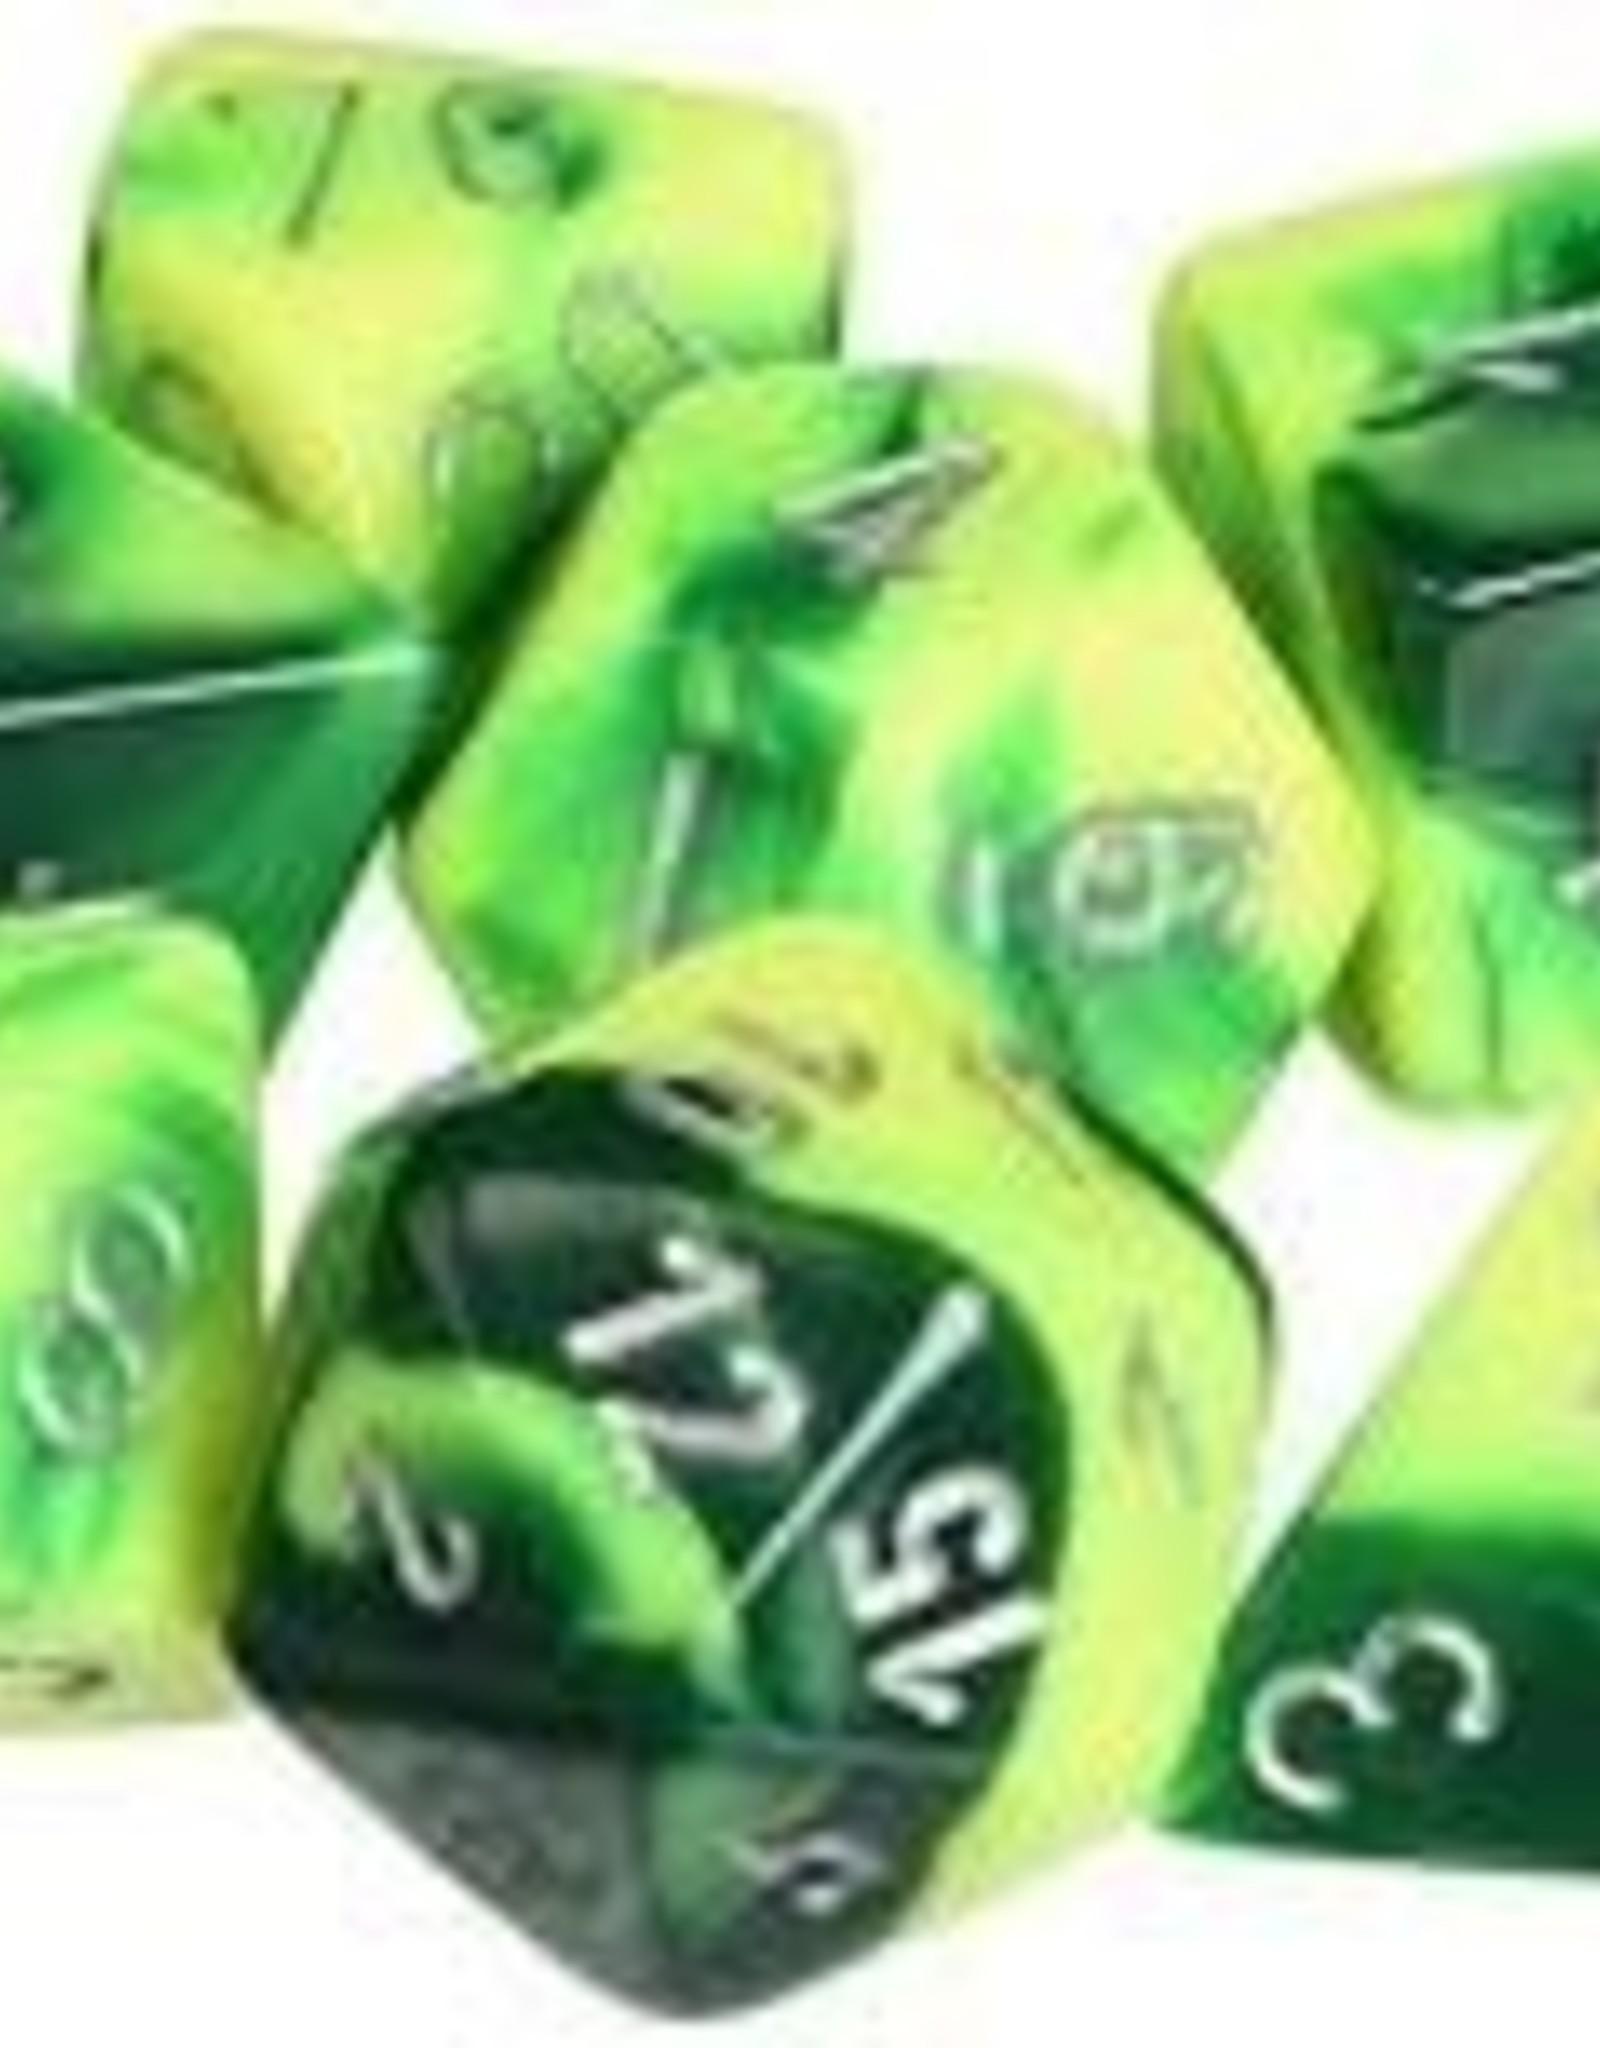 Chessex Gemini Poly 7 set: Green & Yellow w/ Silver